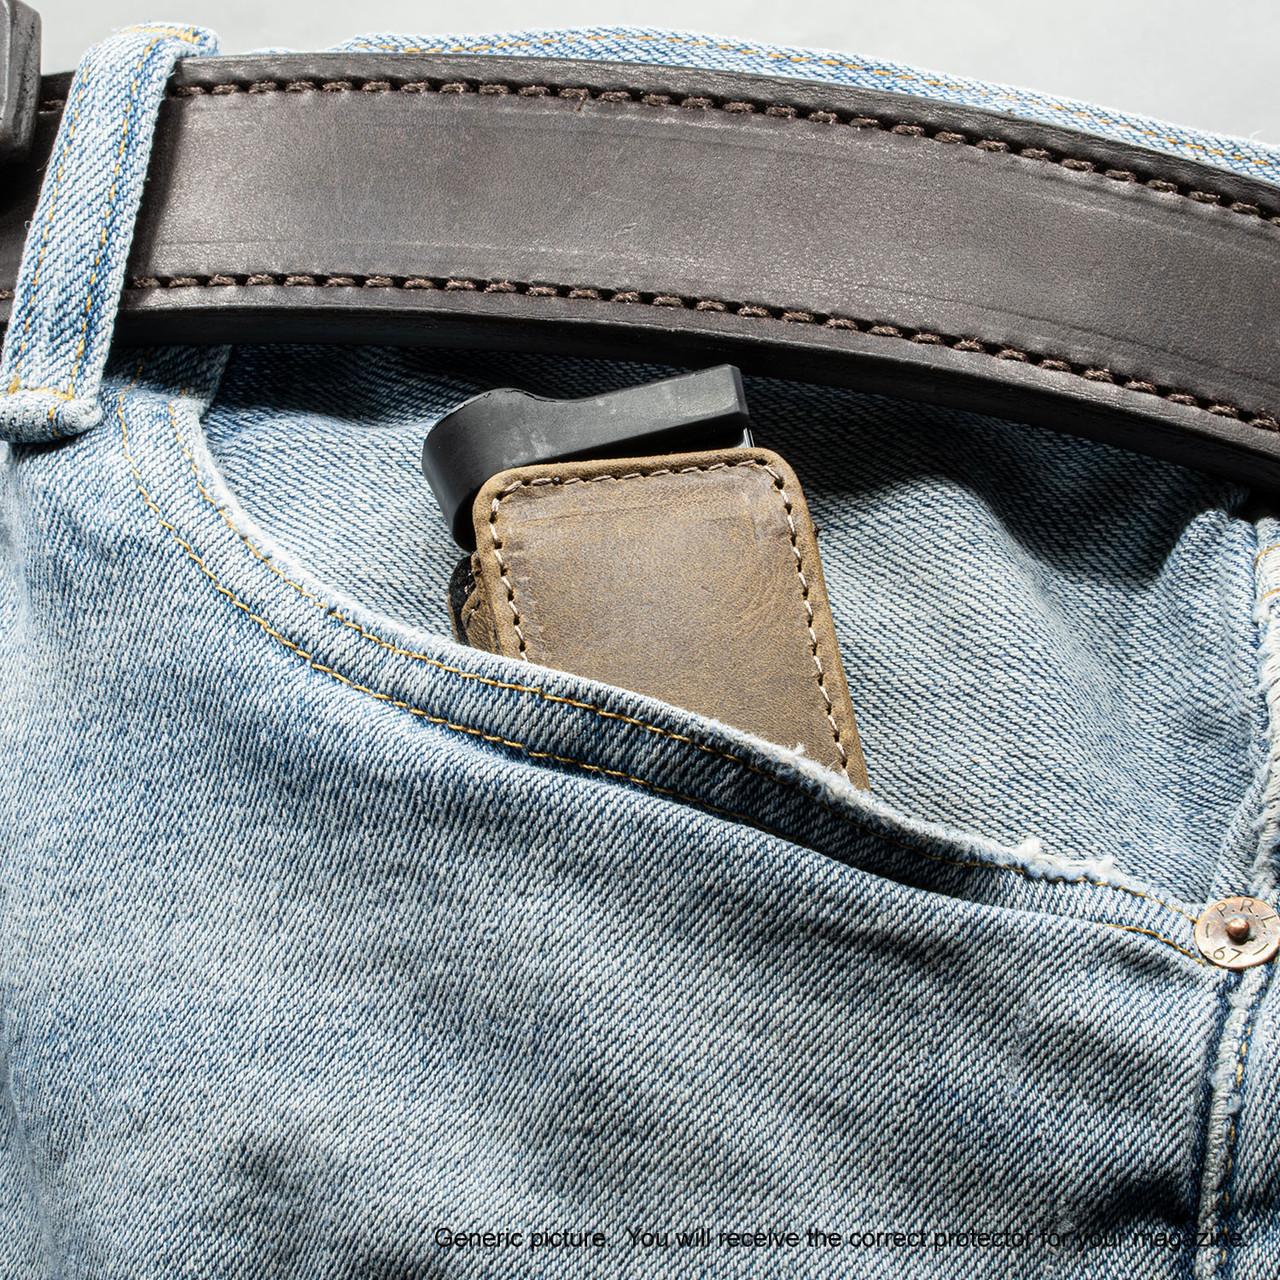 Remington R51 Brown Freedom Magazine Pocket Protector